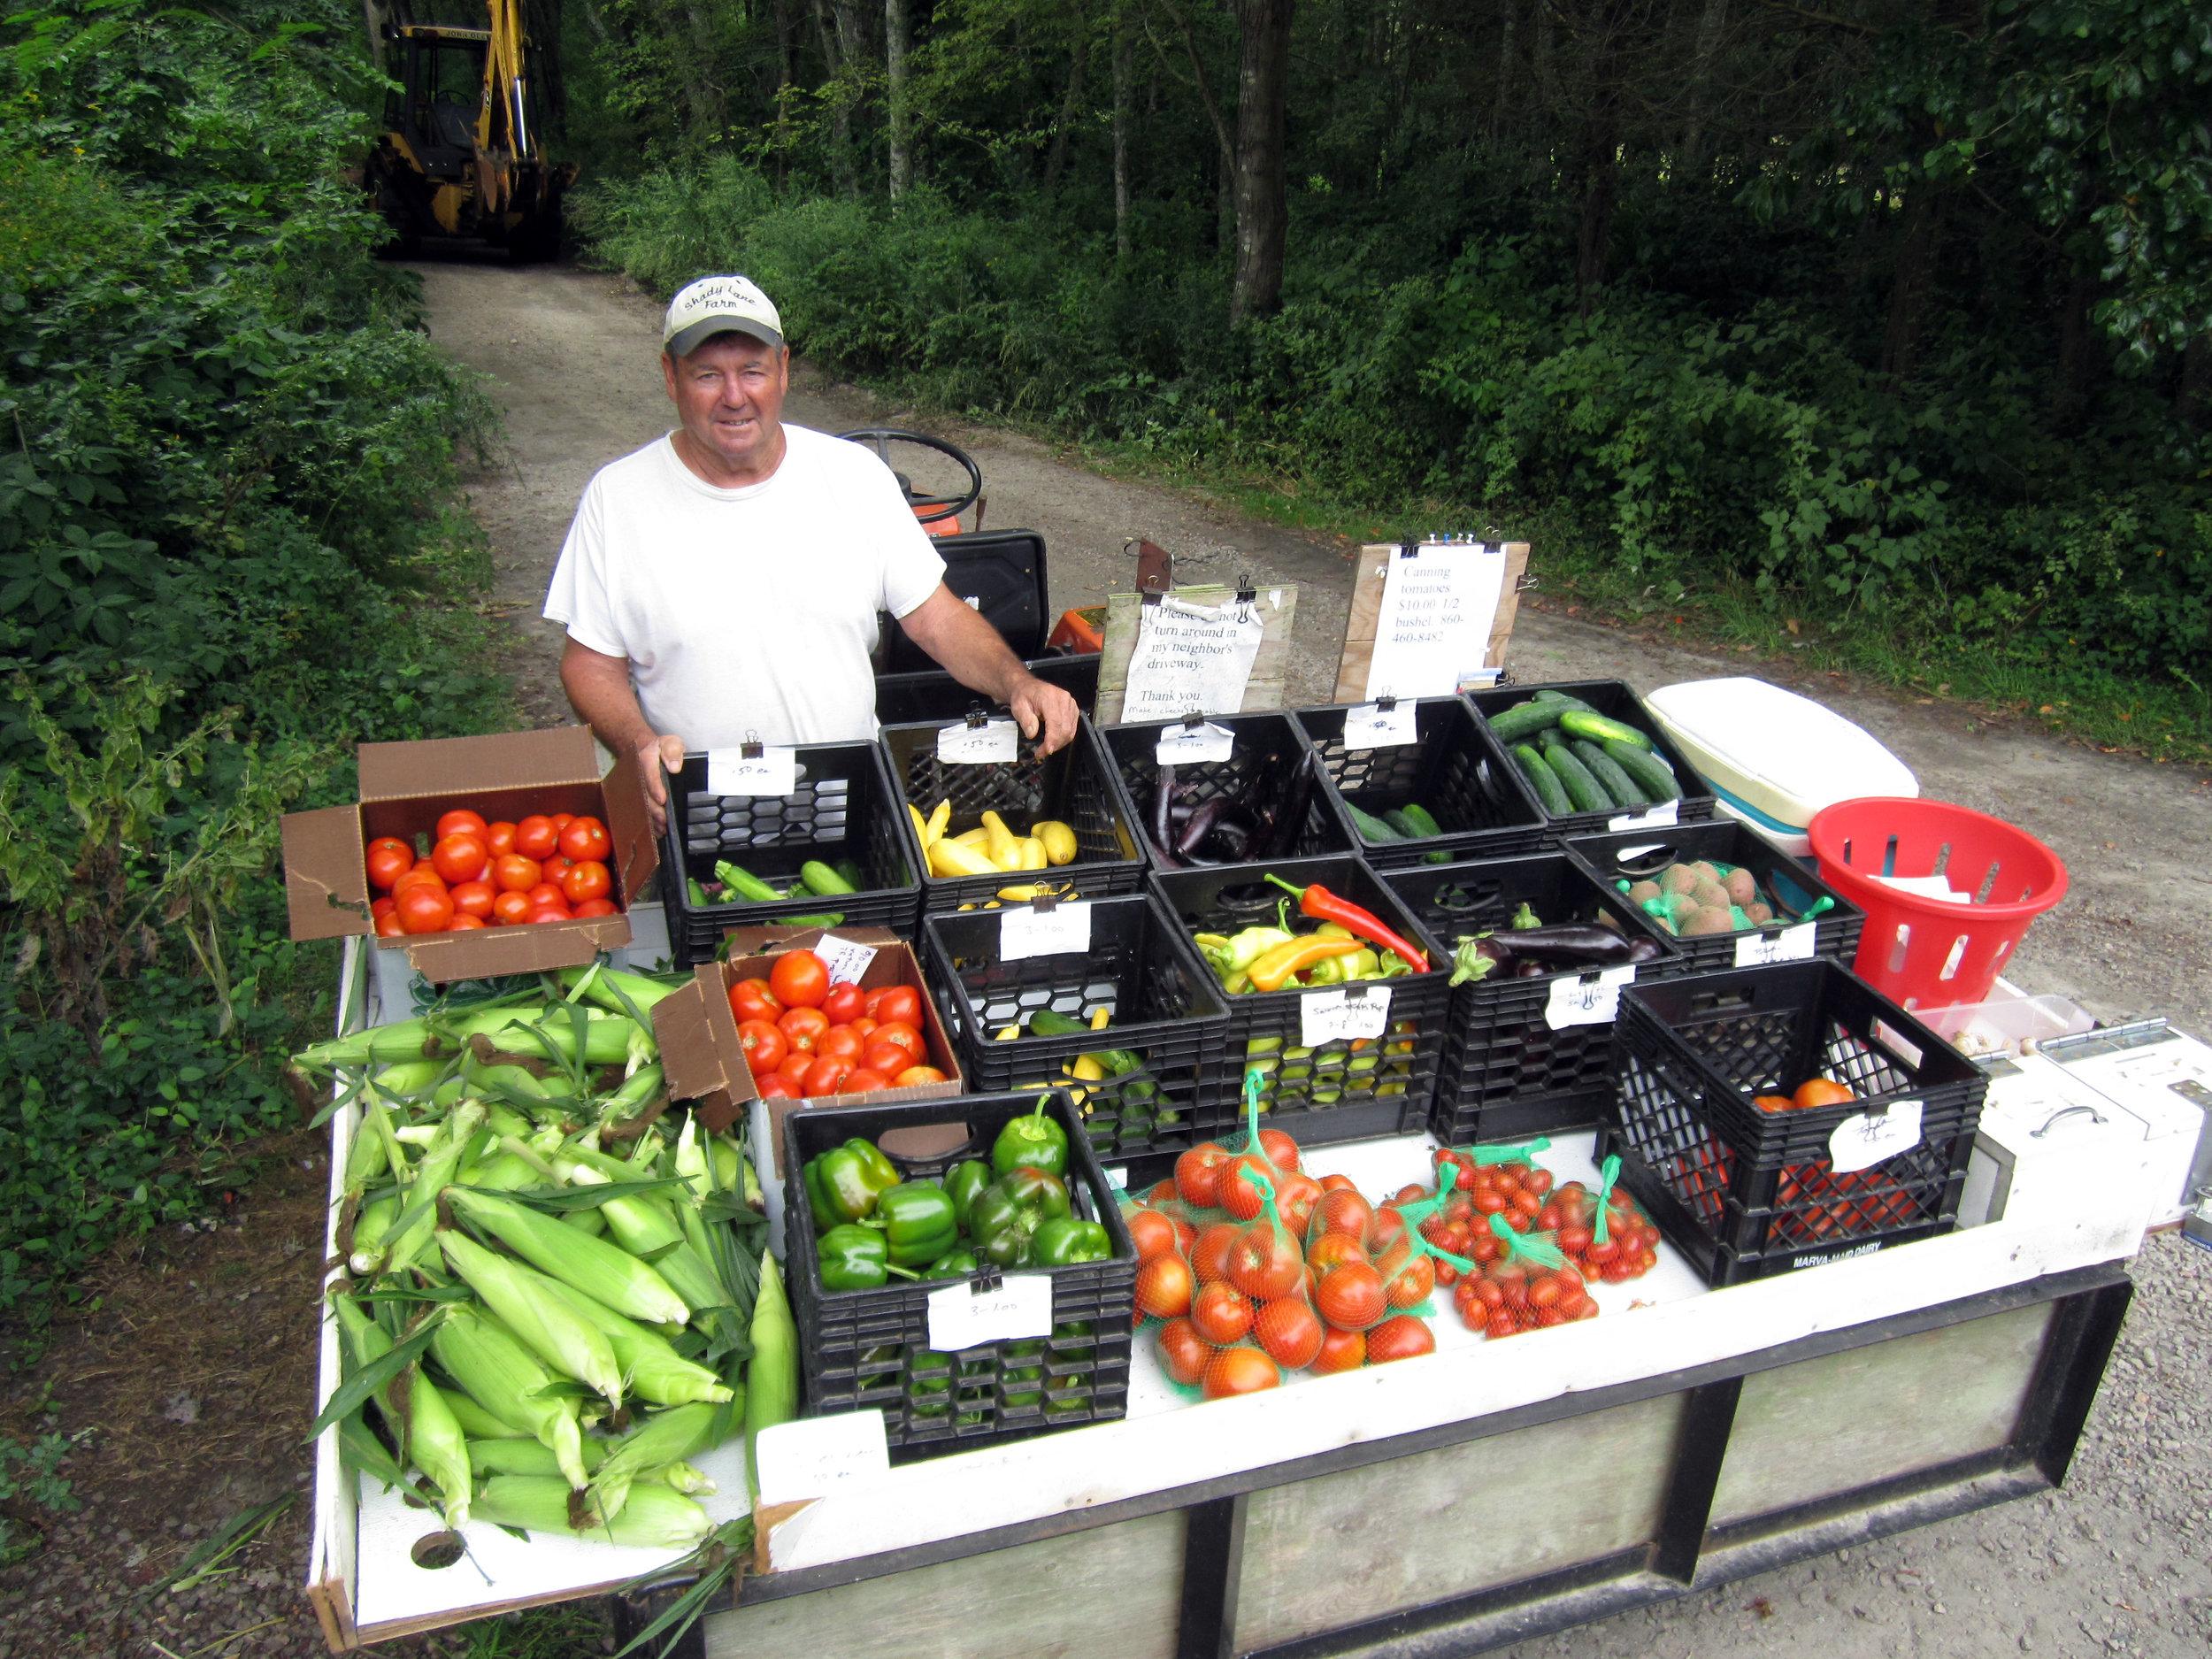 Farmer Bessette's Produce Wagon, Farm Stand.jpg